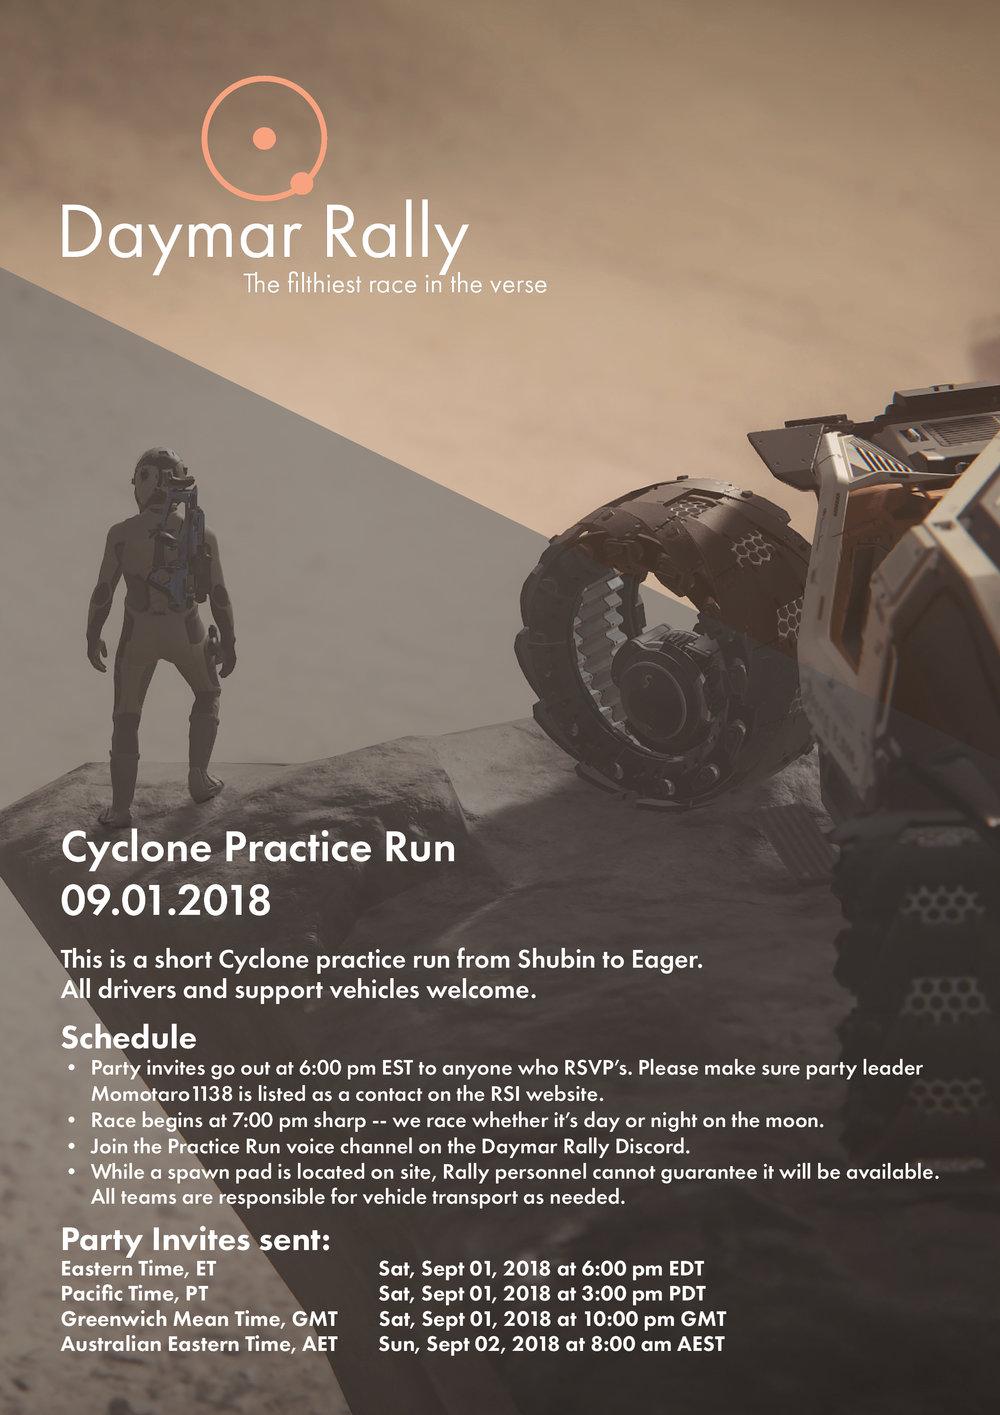 CyclonePracticeRun_Momo_Schedule.jpg